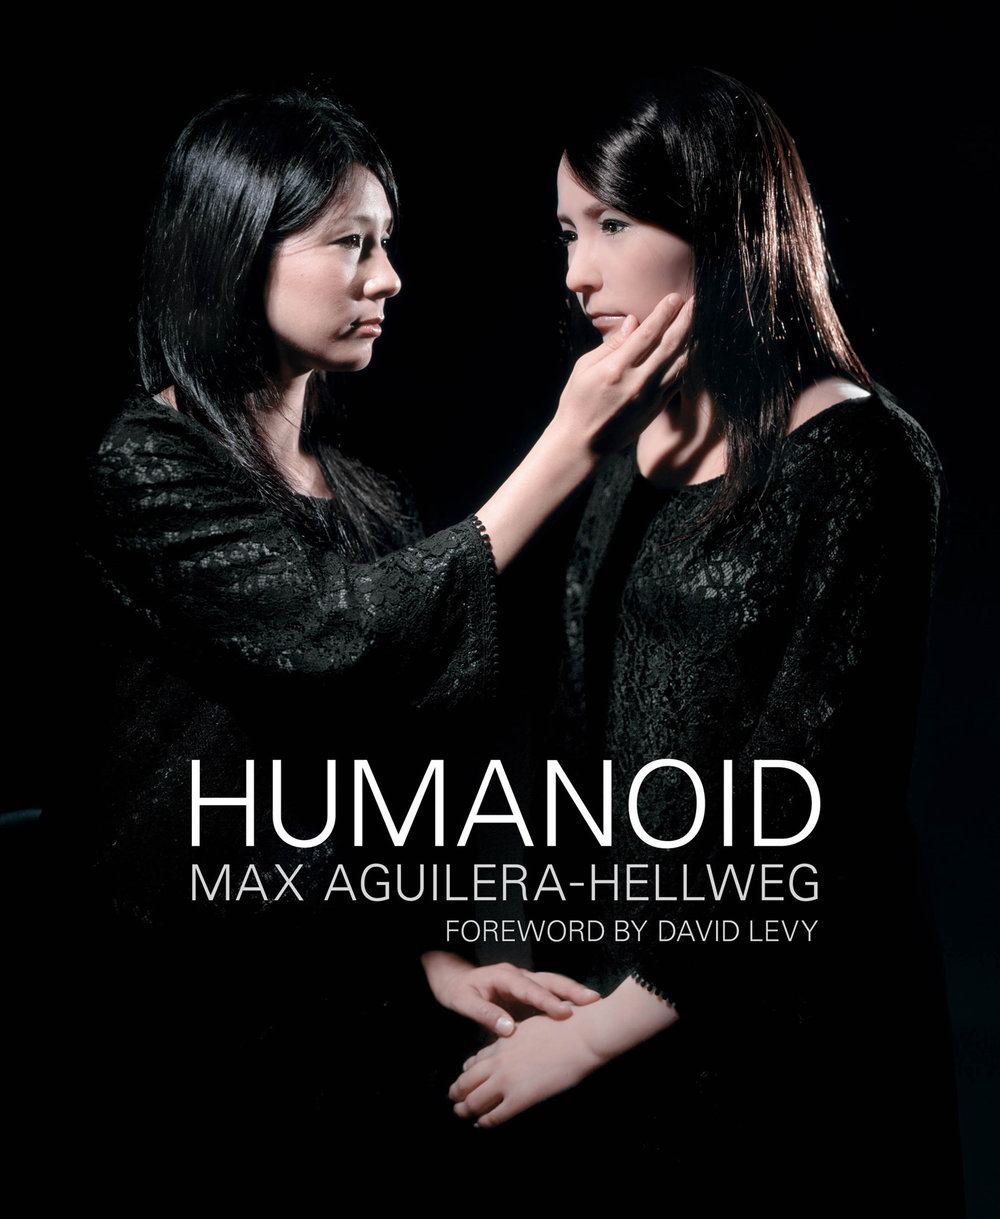 HumanoidCover_1875.jpg